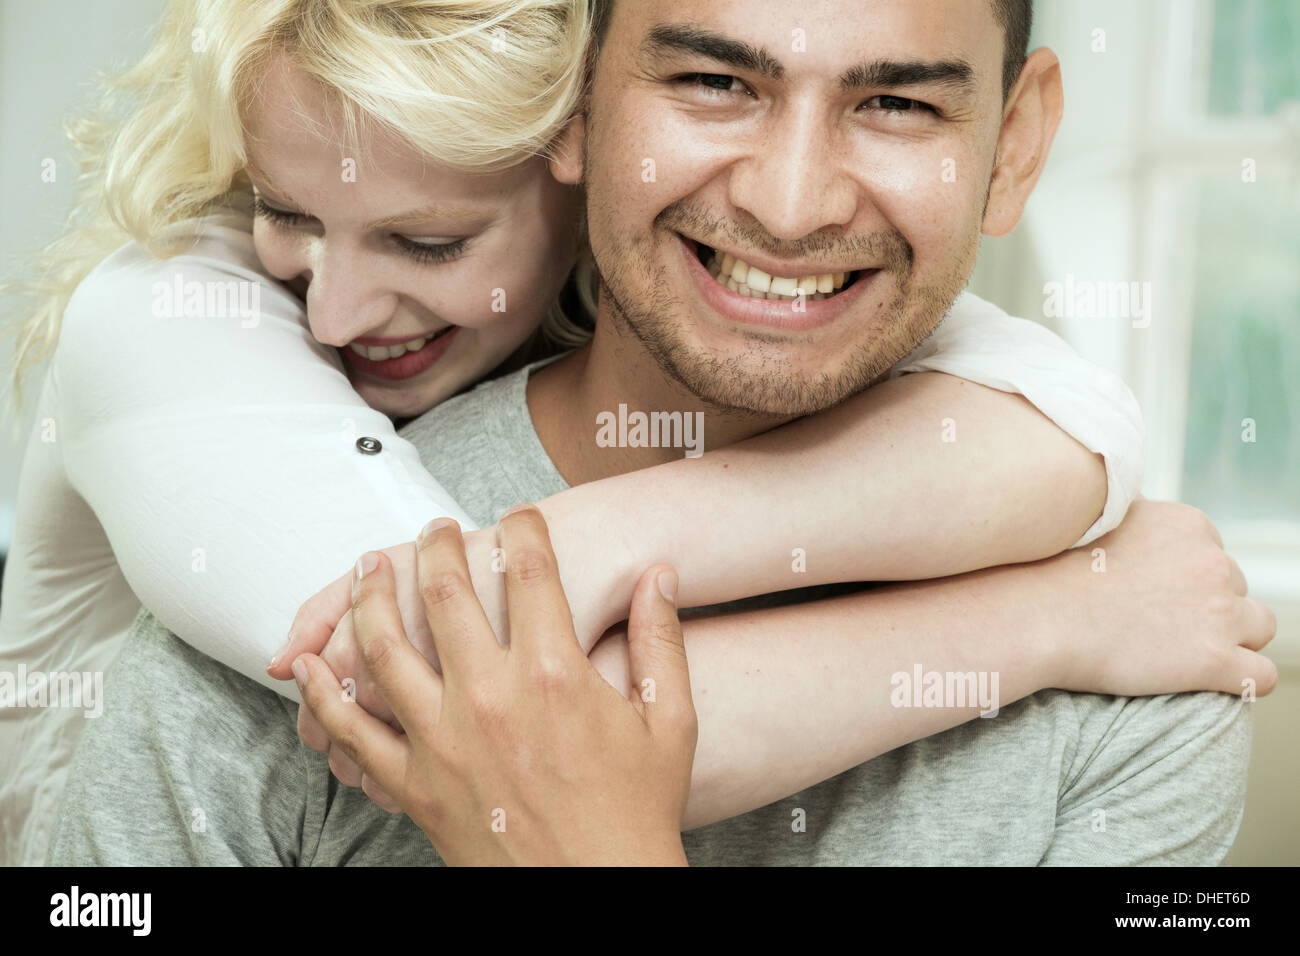 Junge Frau umarmt Freund Stockfoto